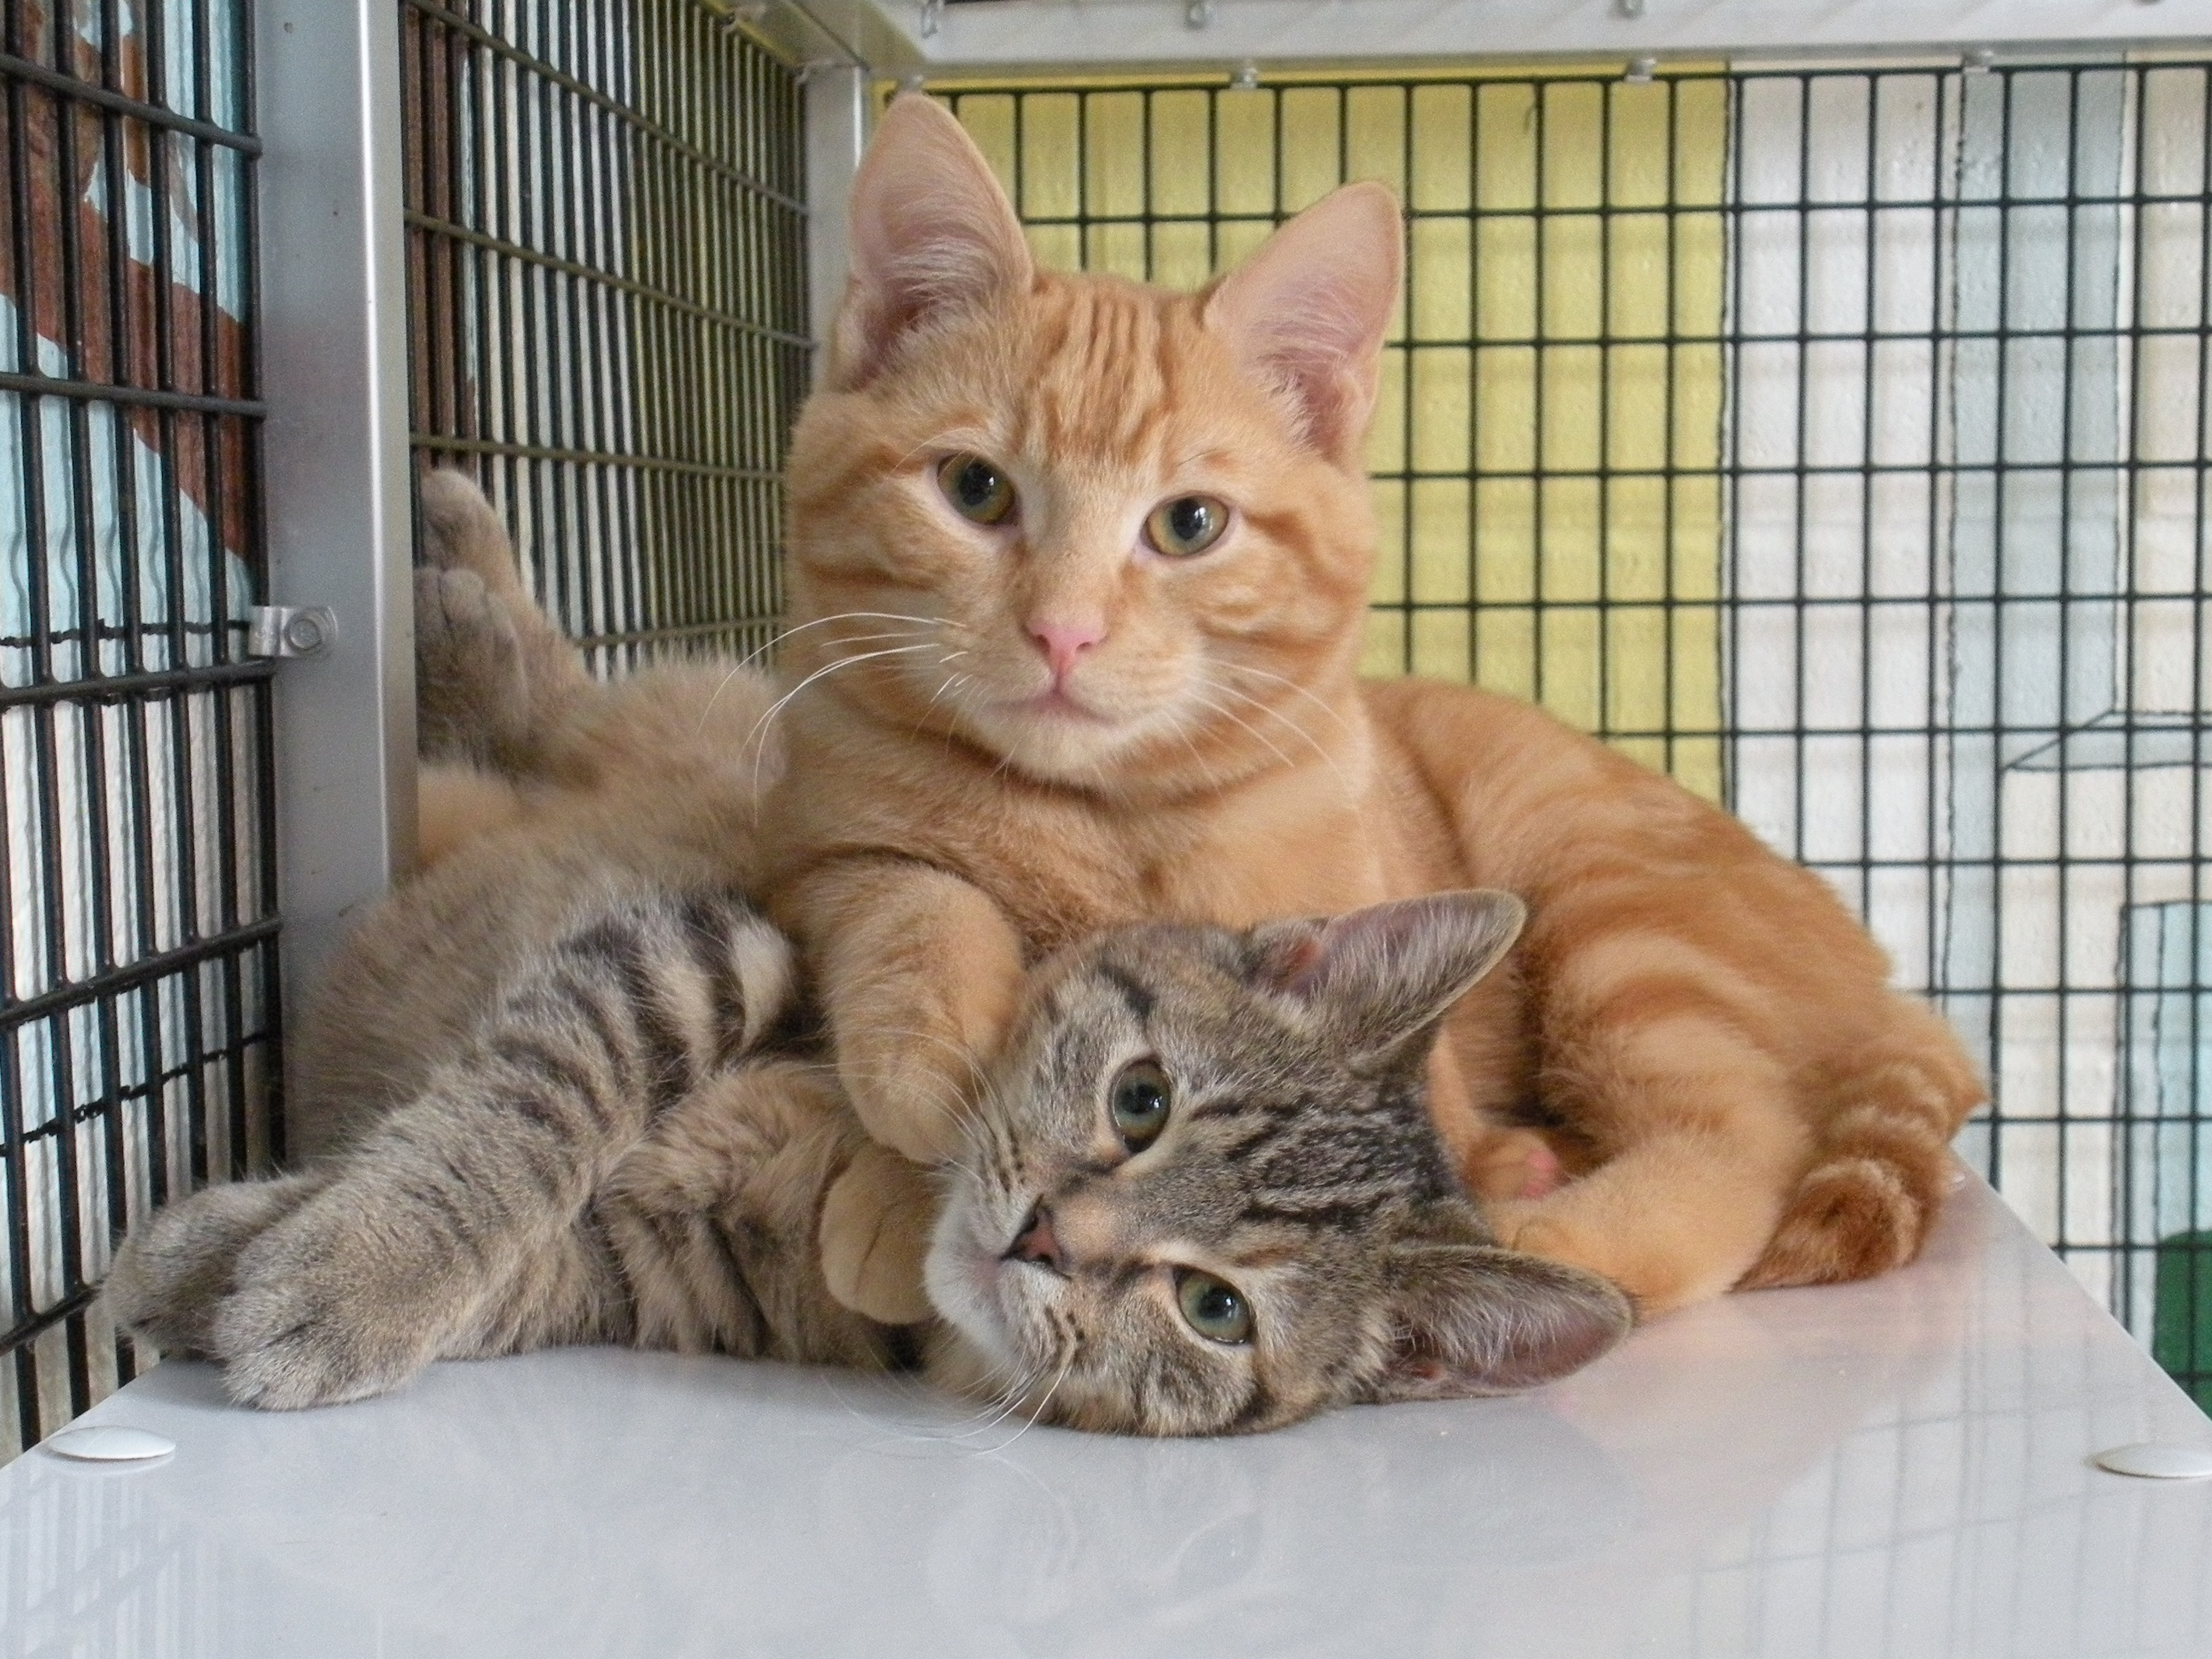 Shelter cat3